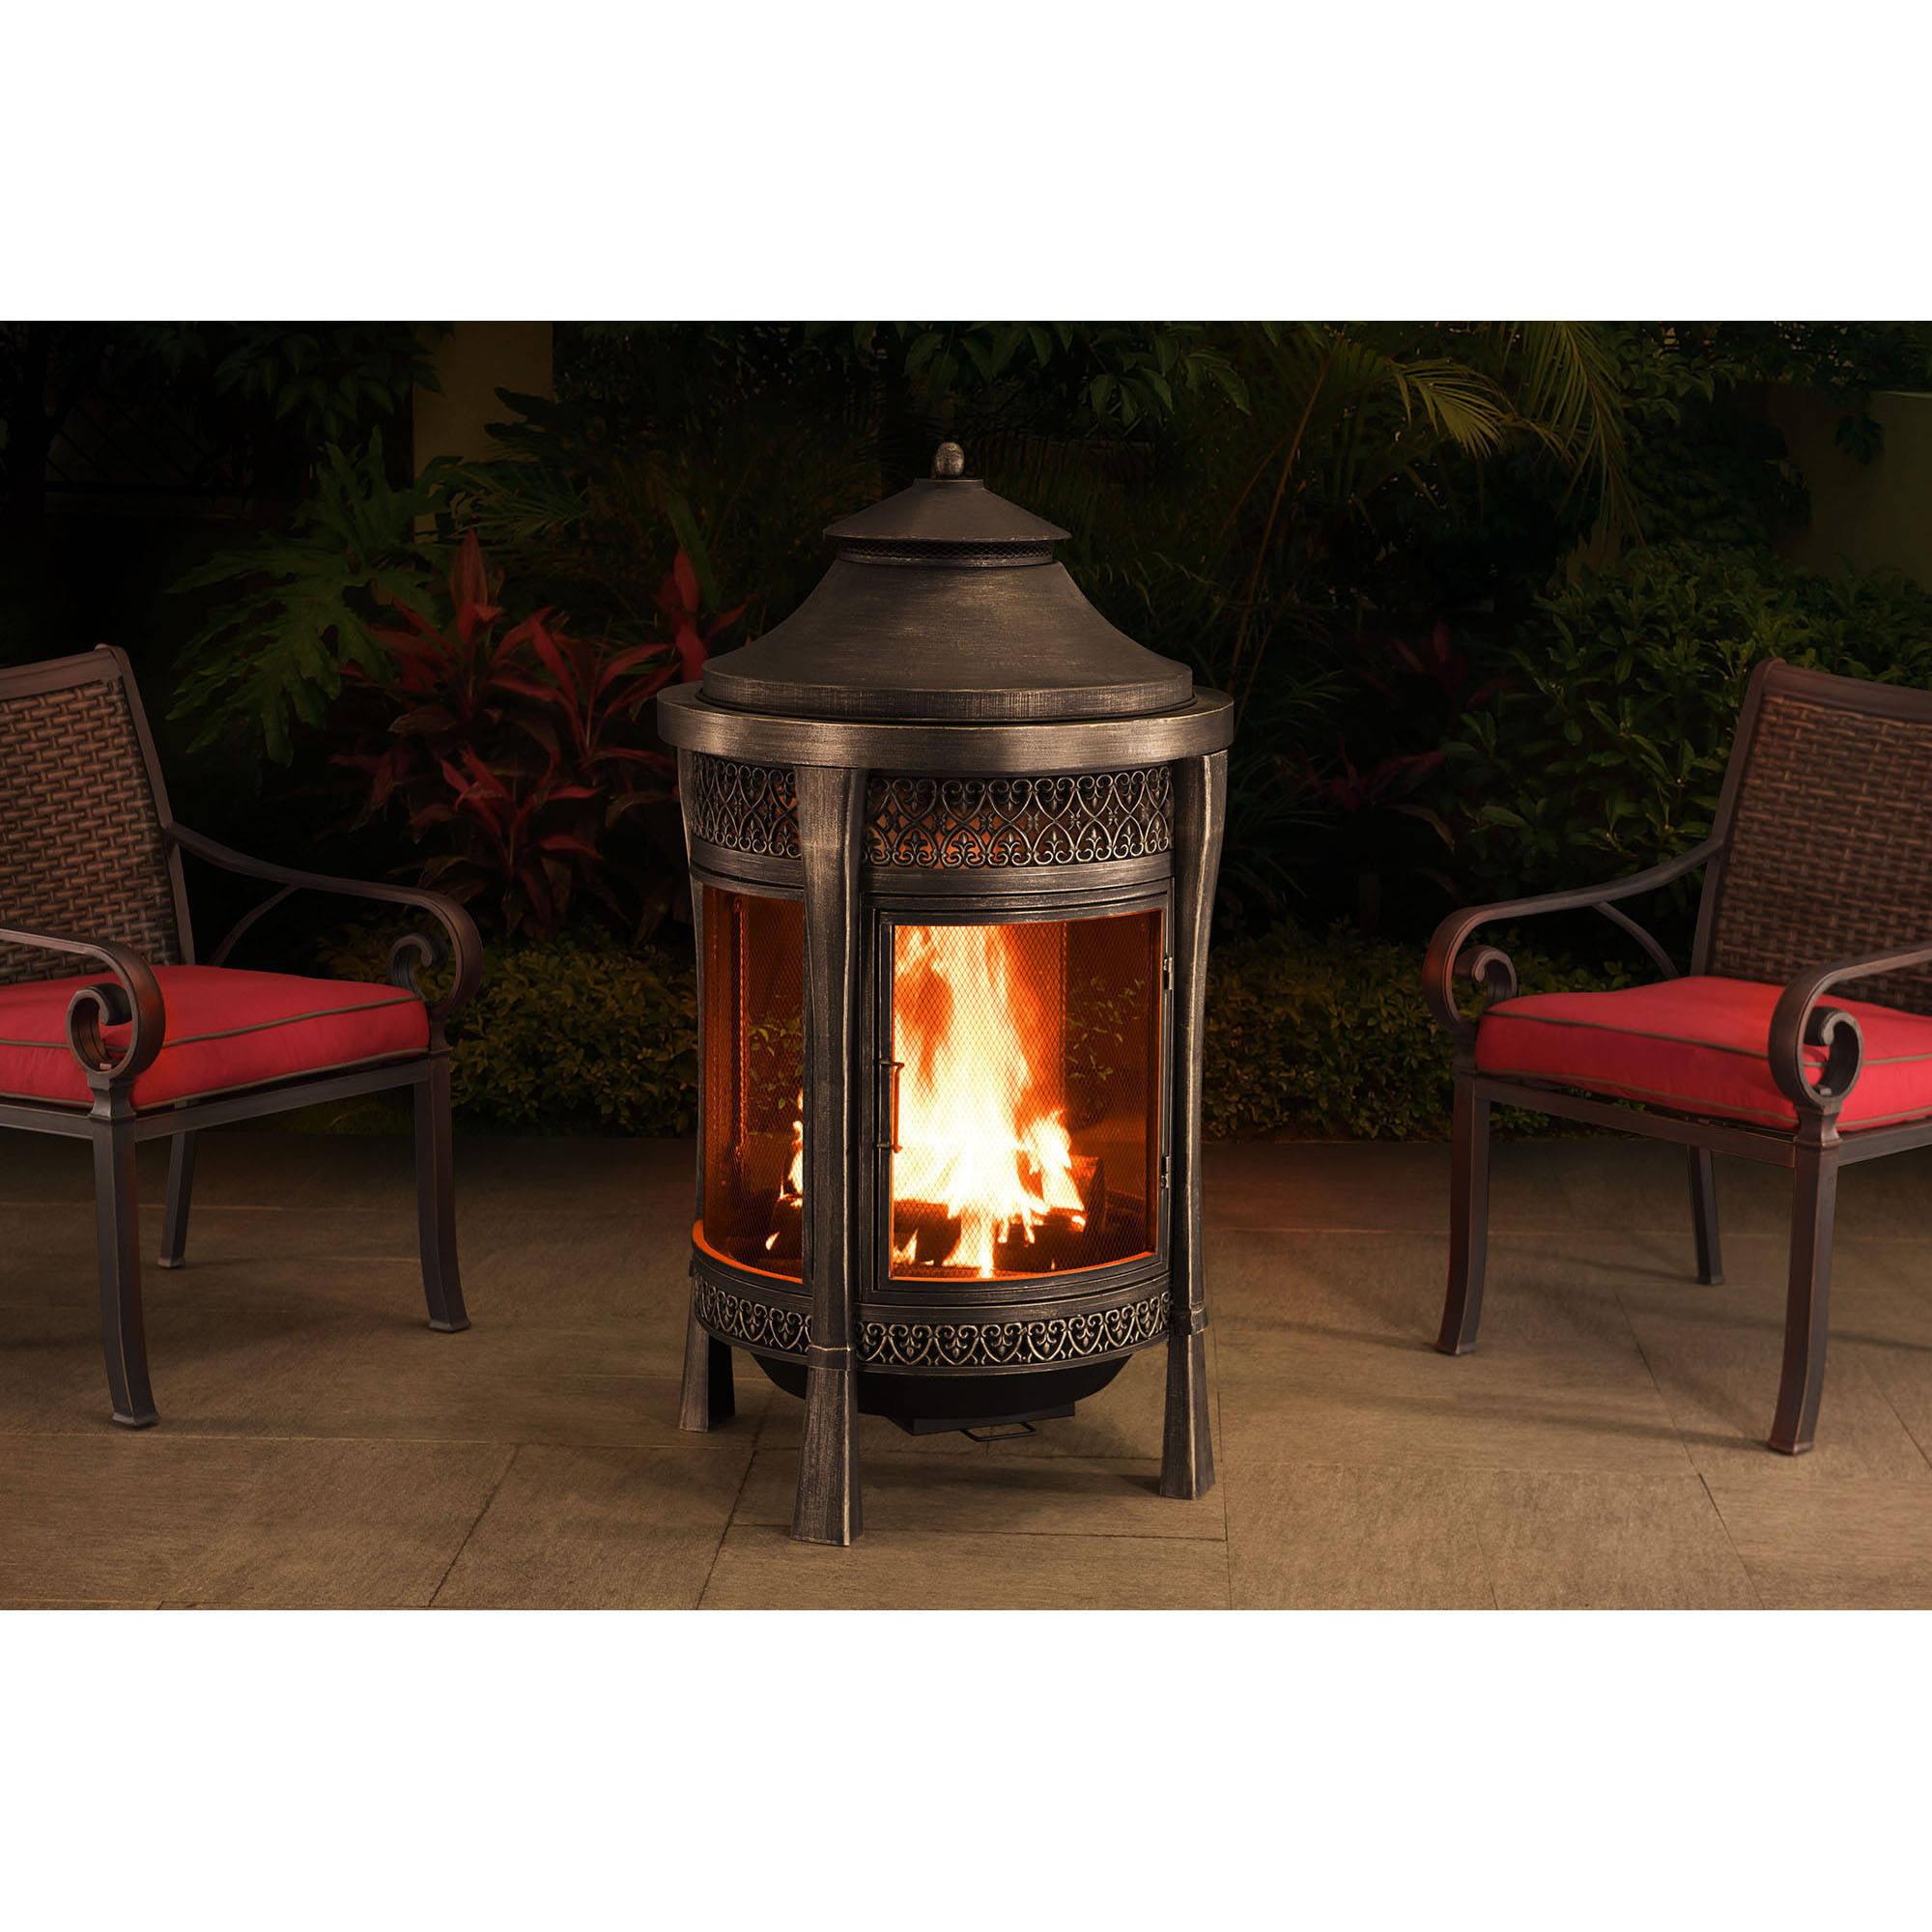 Sunjoy 110504002 Brown 62 Cast Steel Outdoor Fireplace by SunNest Services LLC